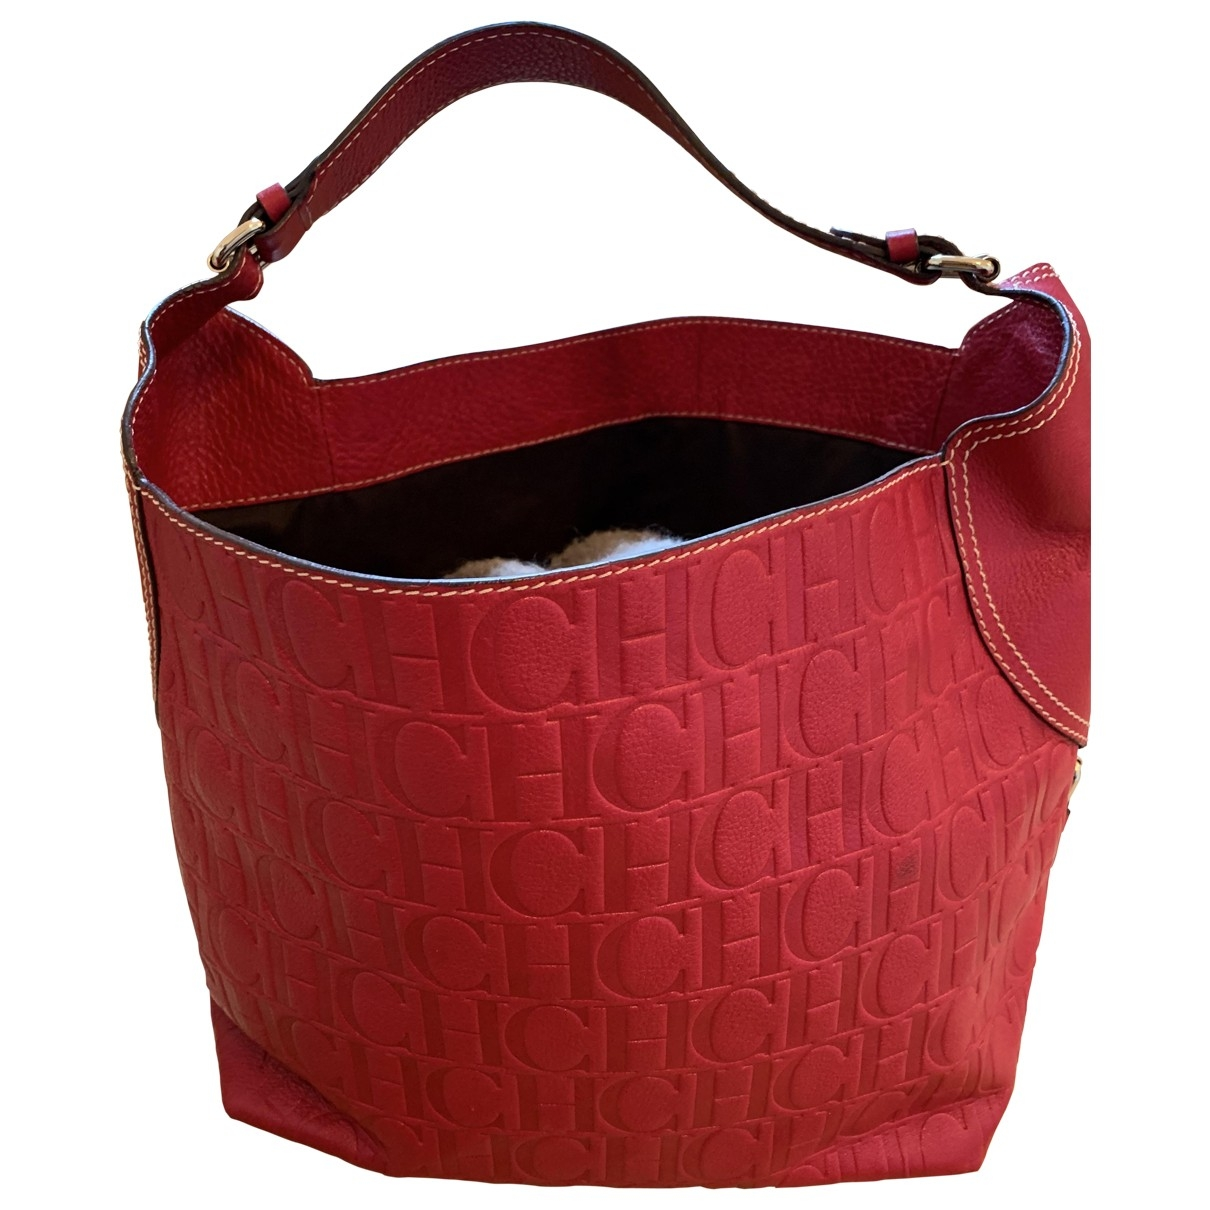 Carolina Herrera \N Handtasche in  Rot Fell